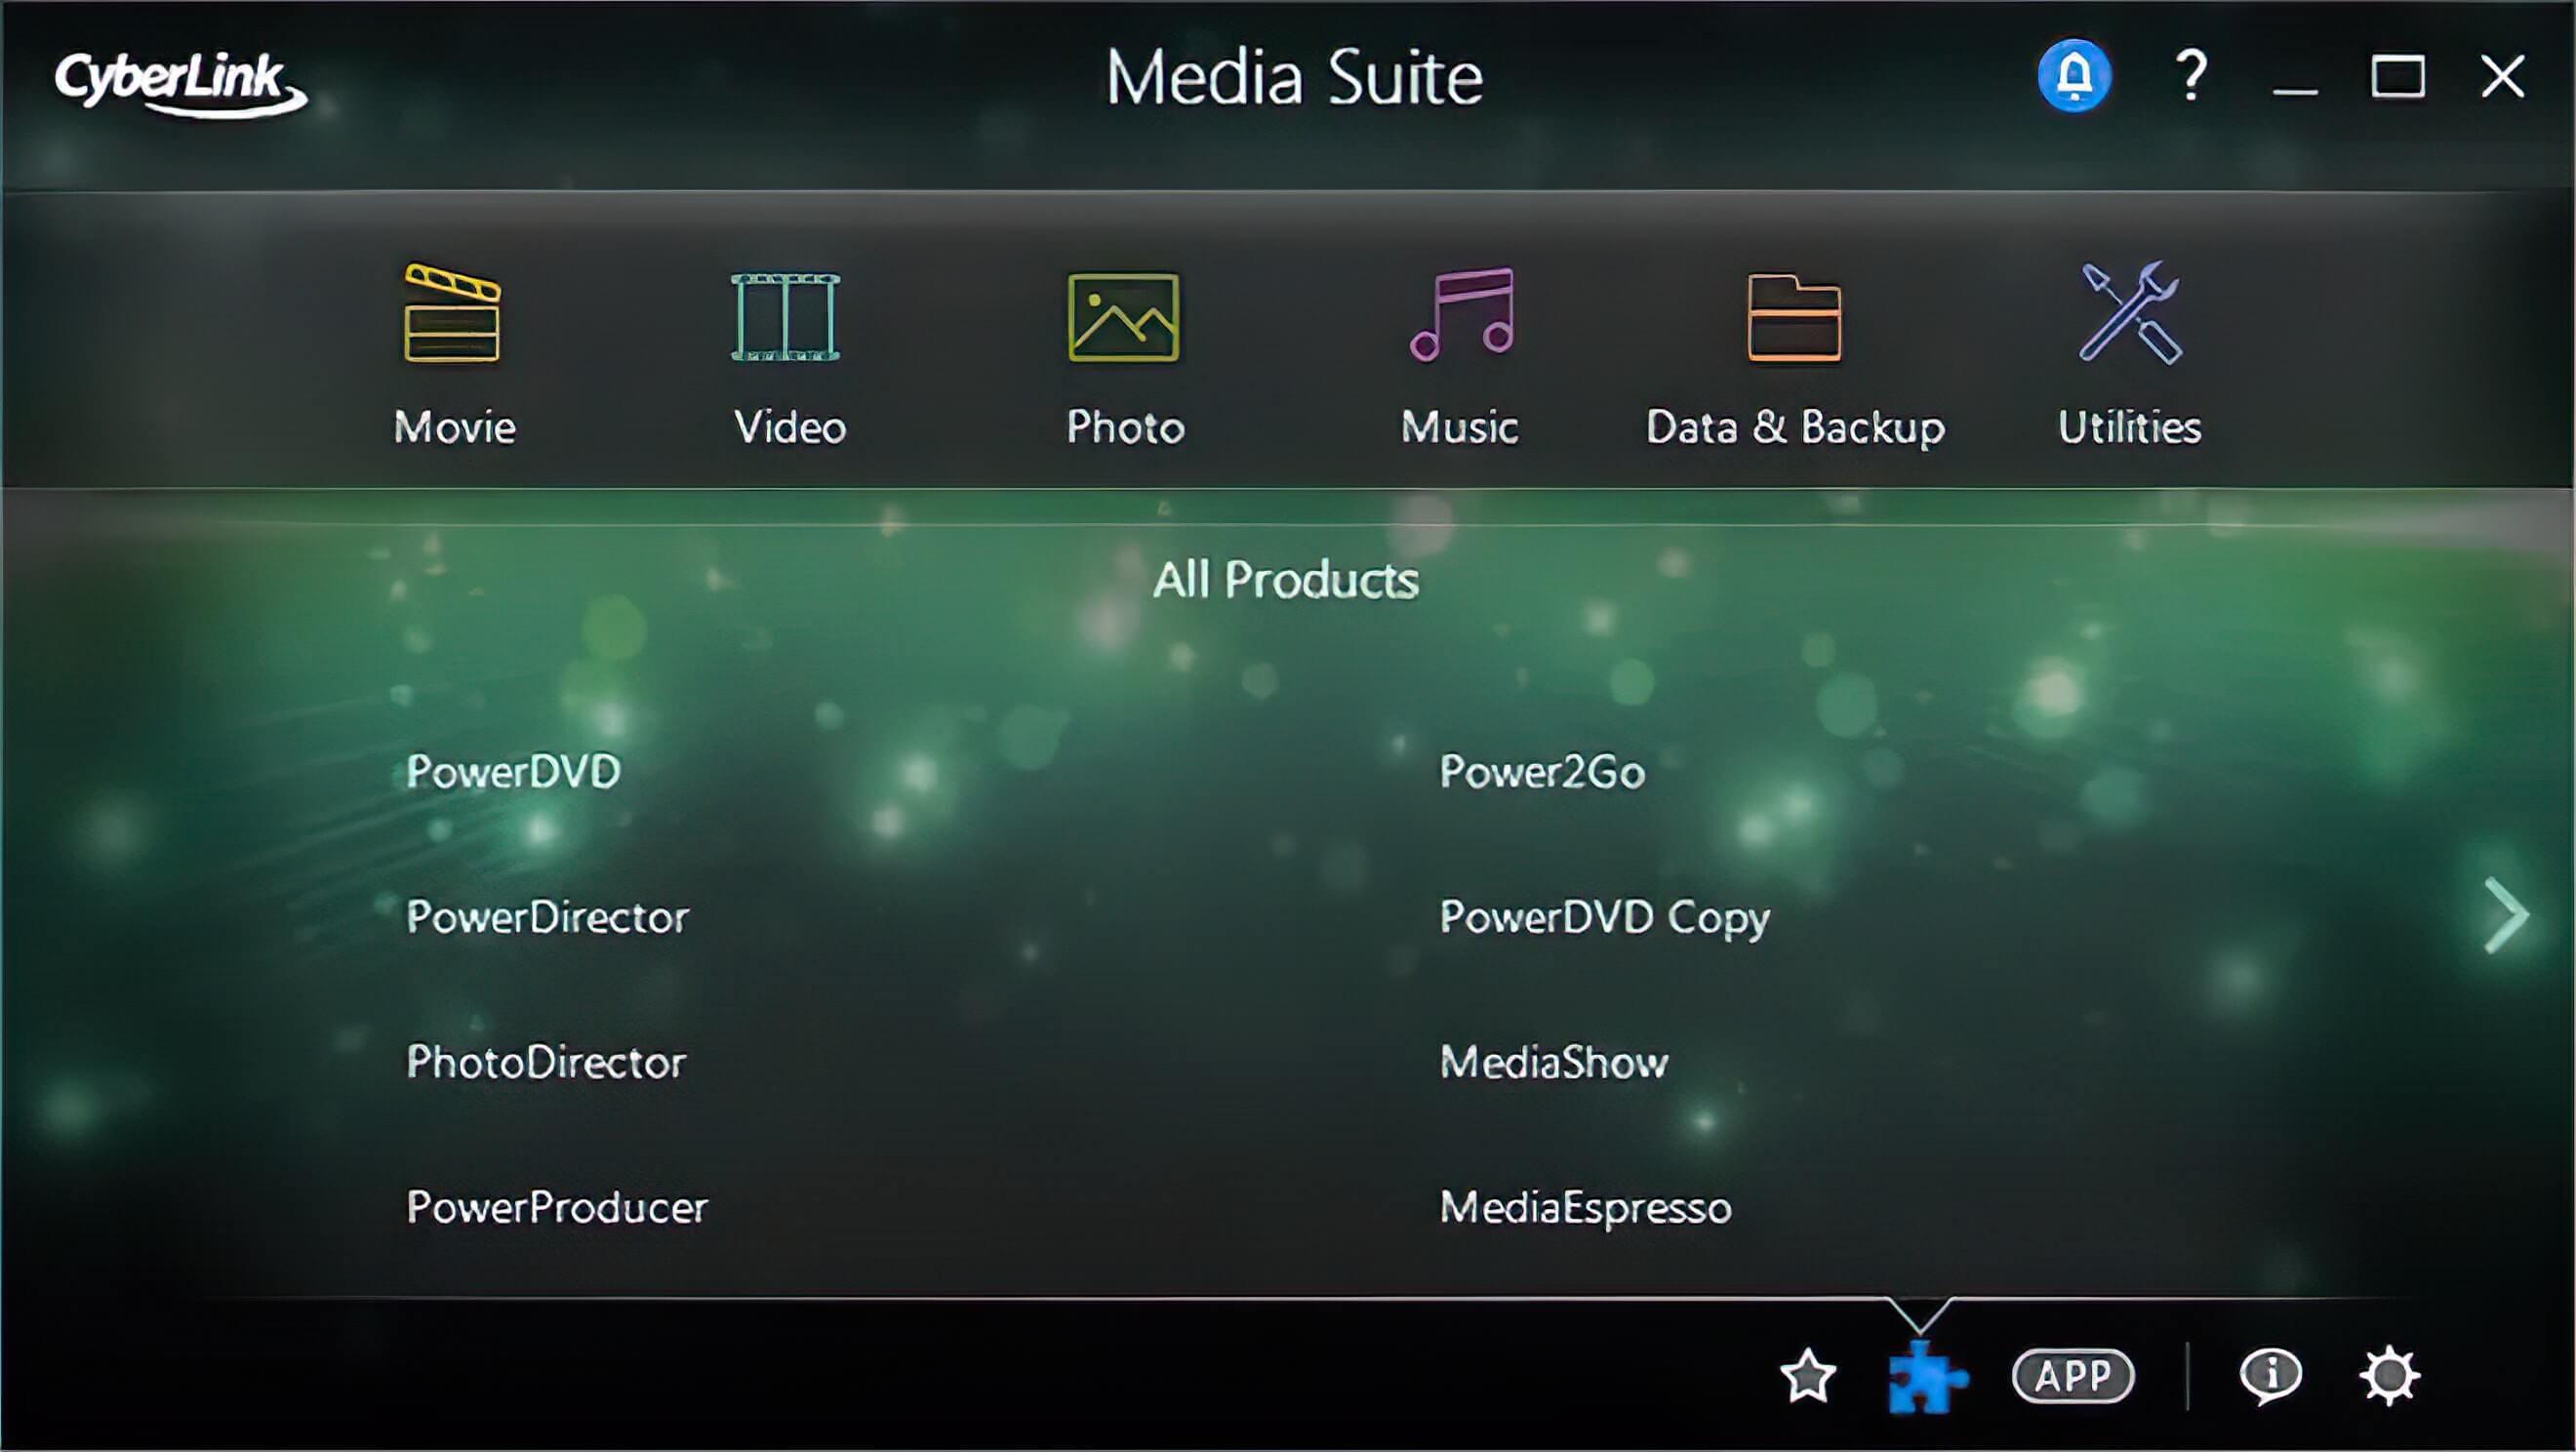 CyberLink Media Suite Screenshot